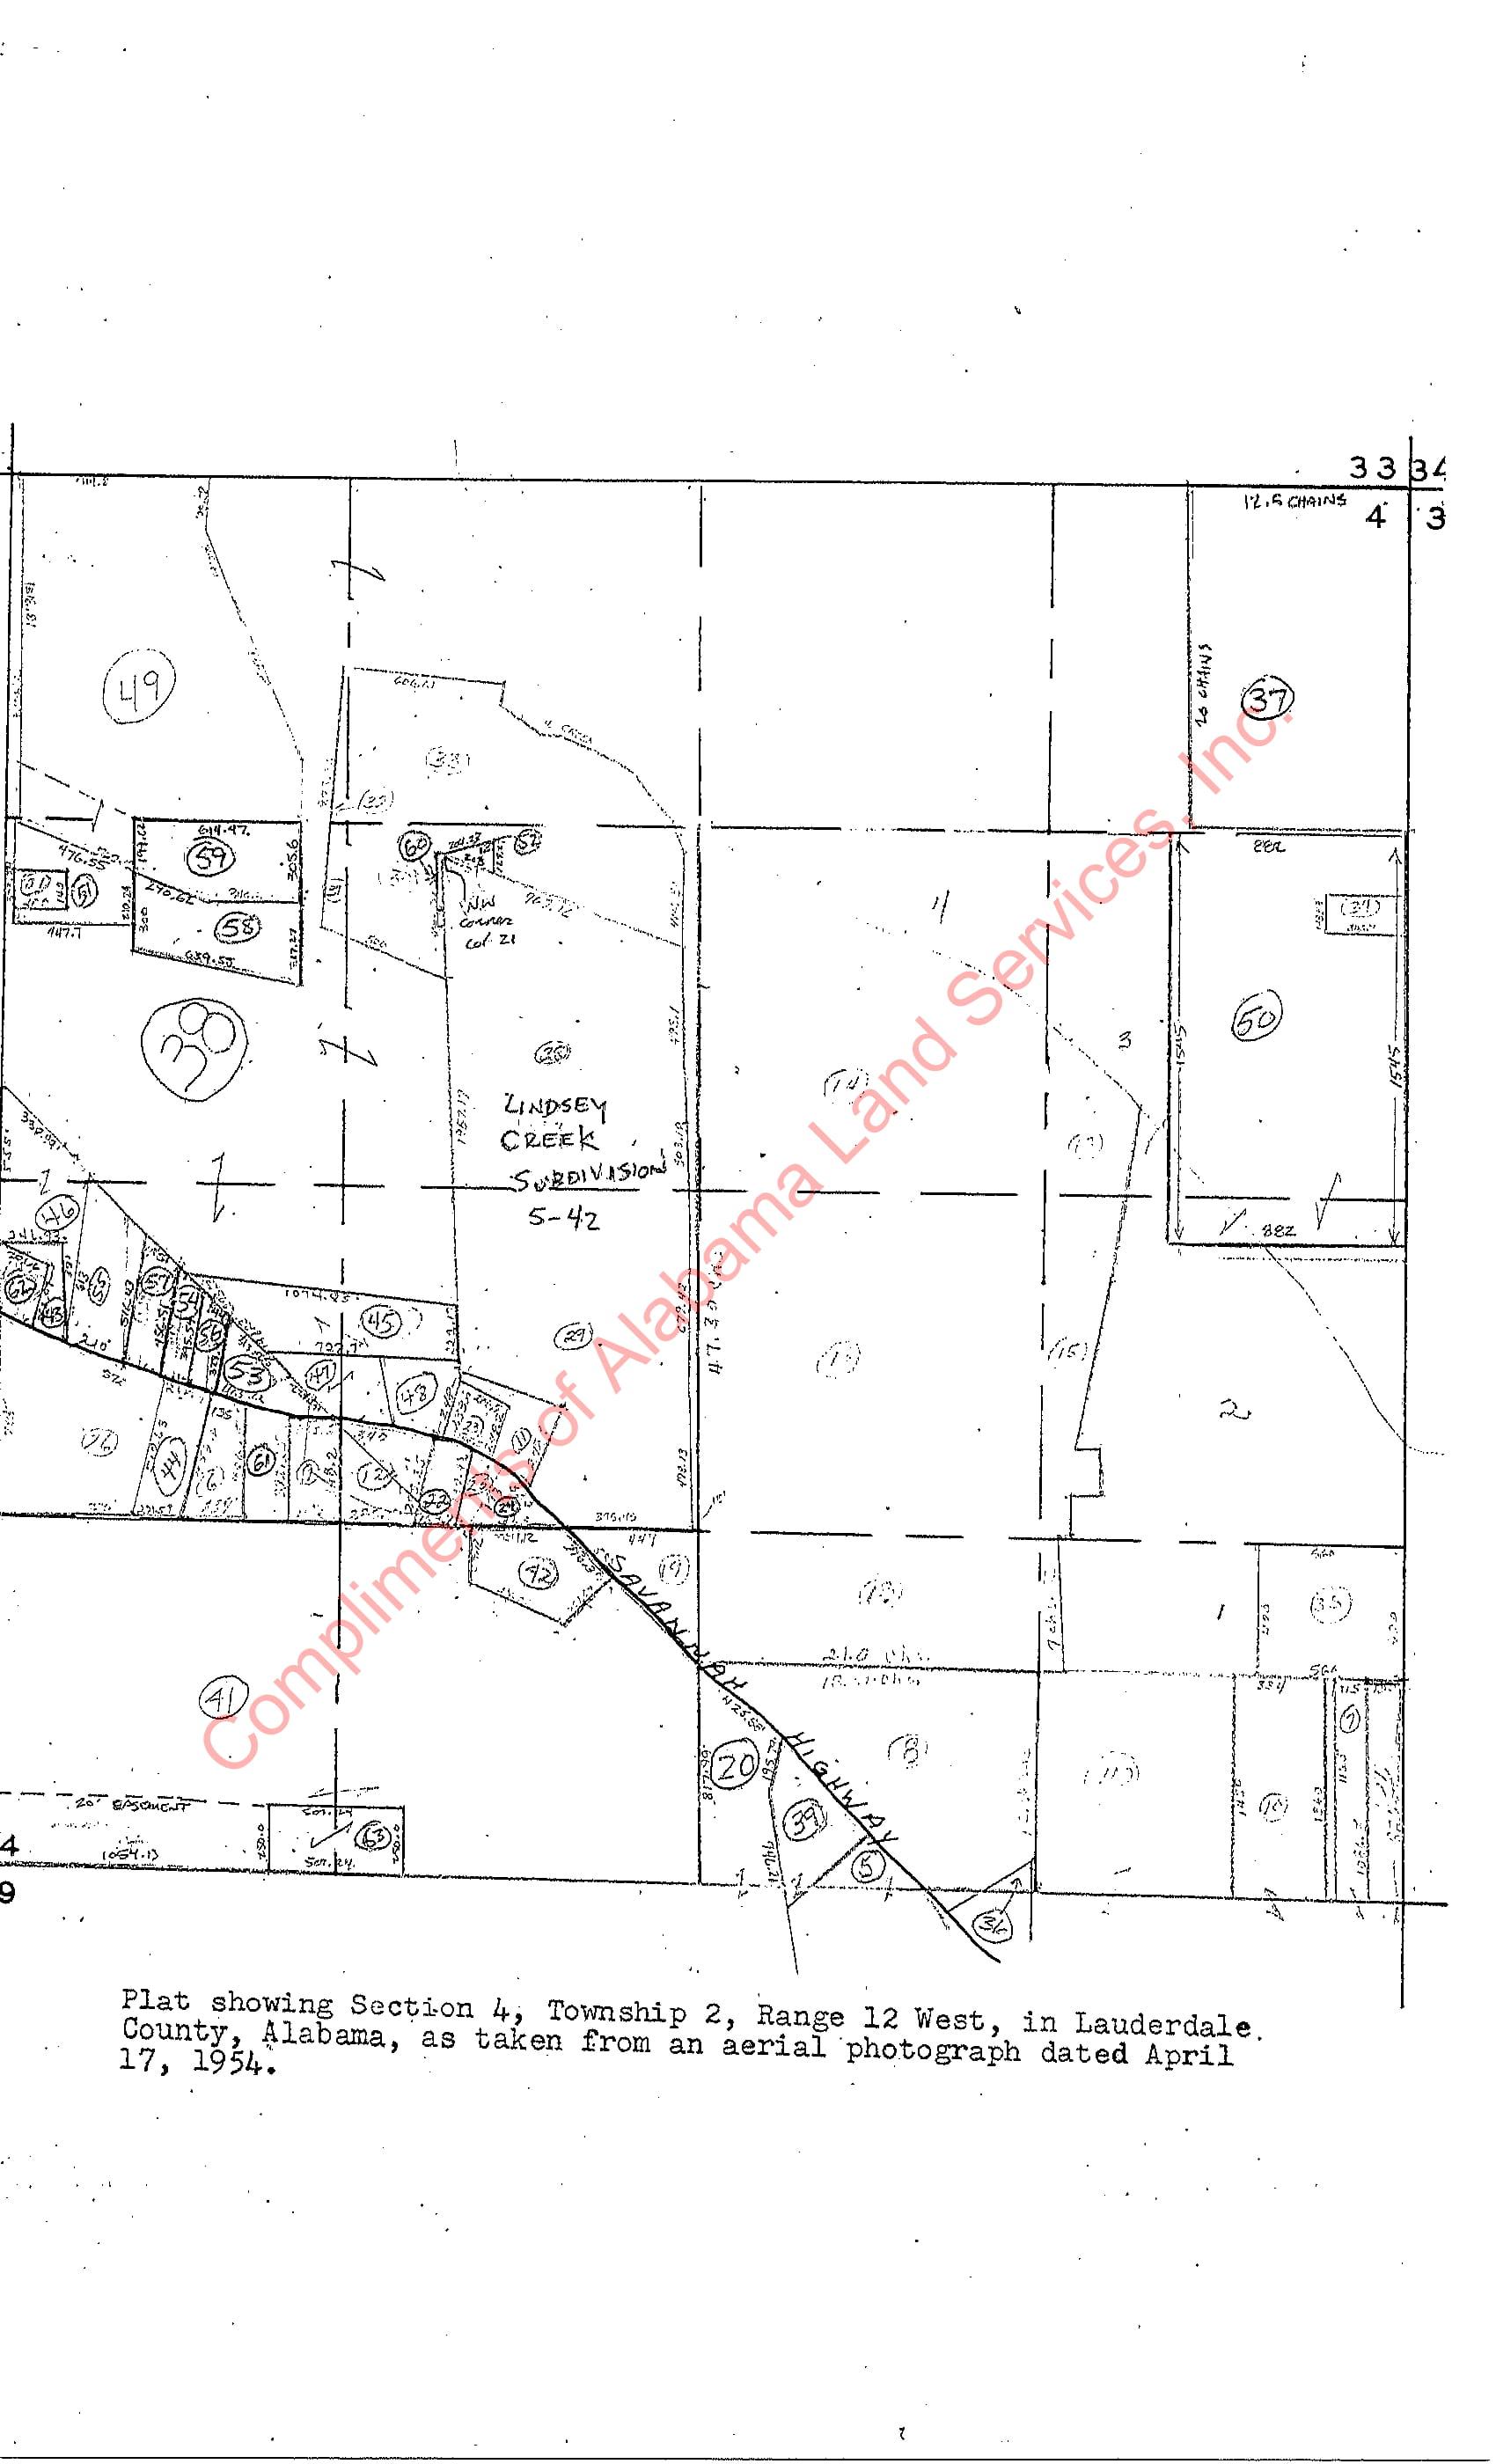 Lindsey Creek Add 1 plat-6.jpg